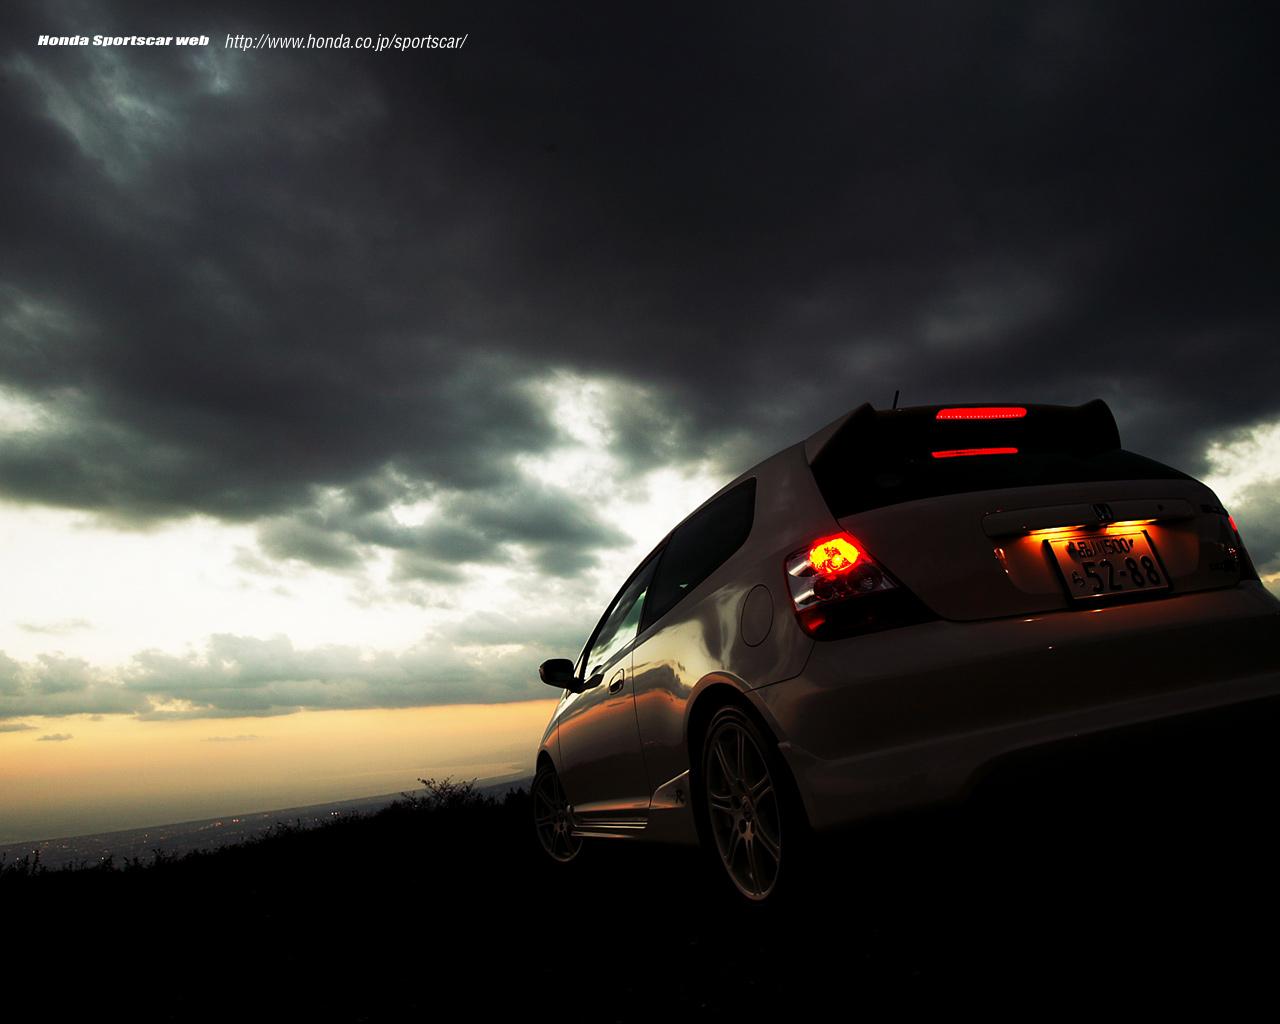 Honda Civic Type R Ep3 Wallpaper   johnywheelscom 1280x1024